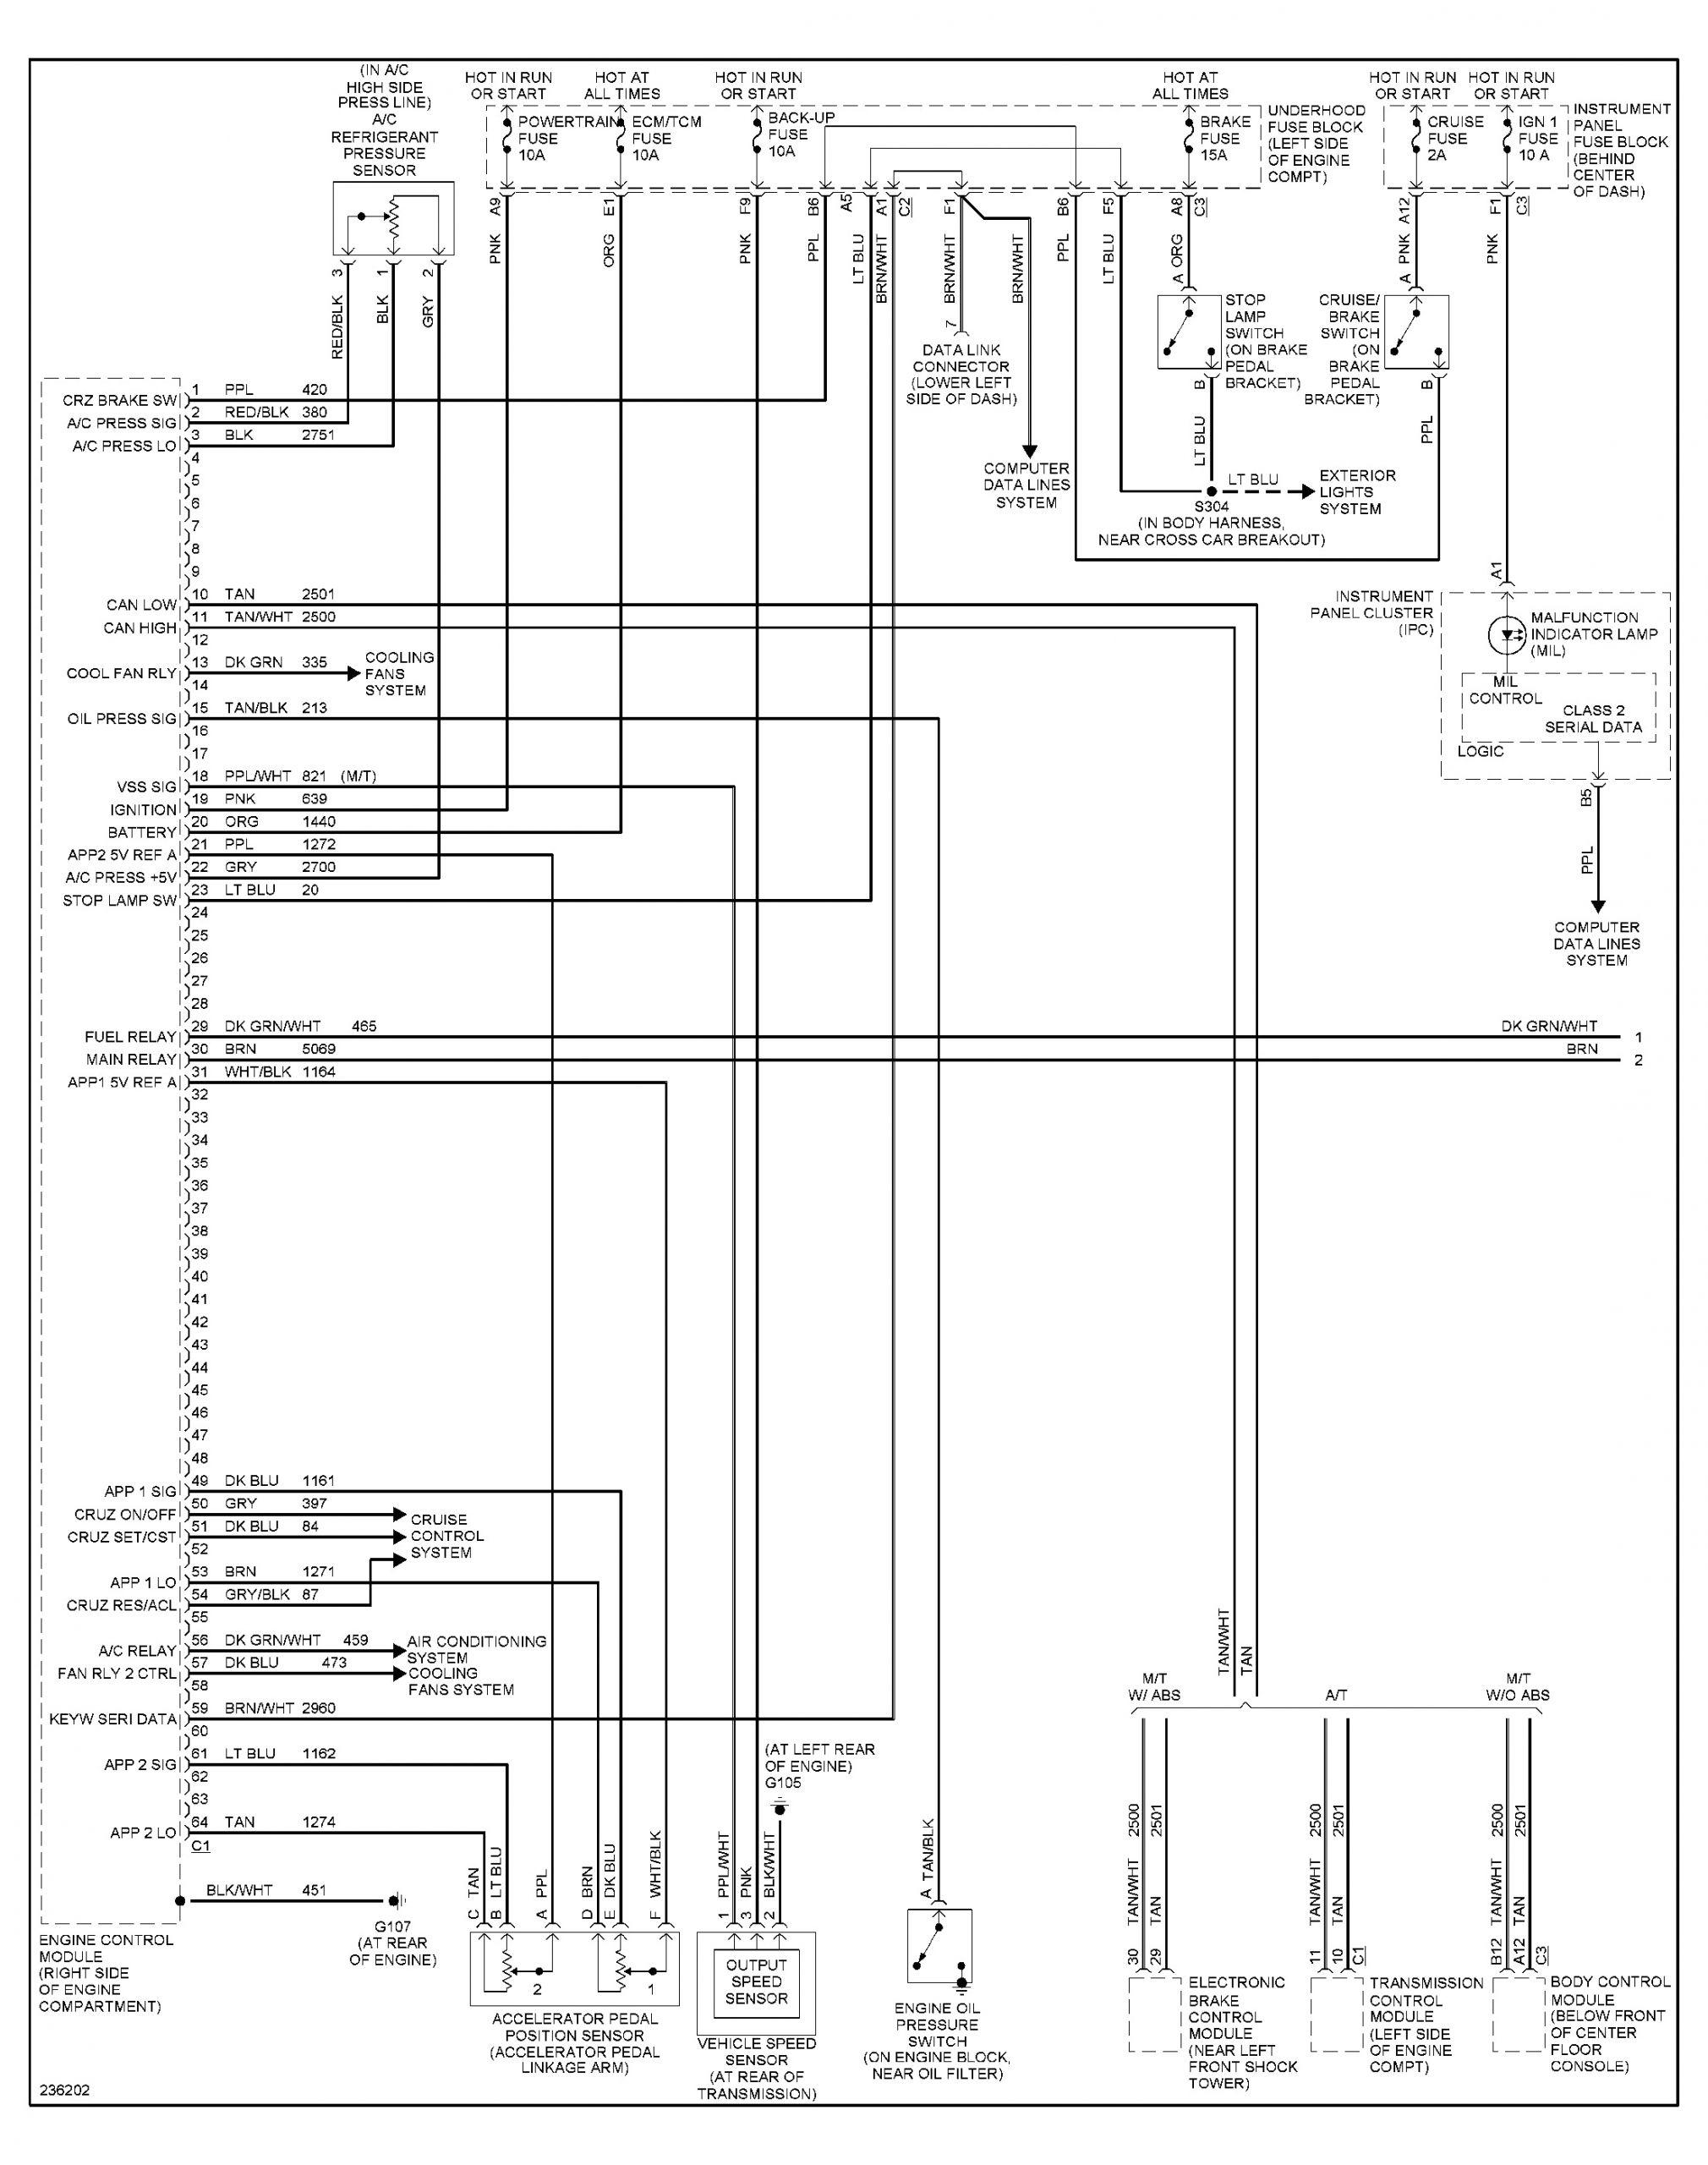 2001 saturn sl1 engine diagram 2008 saturn wiring diagram wiring diagrams of 2001 saturn sl1 engine diagram gif